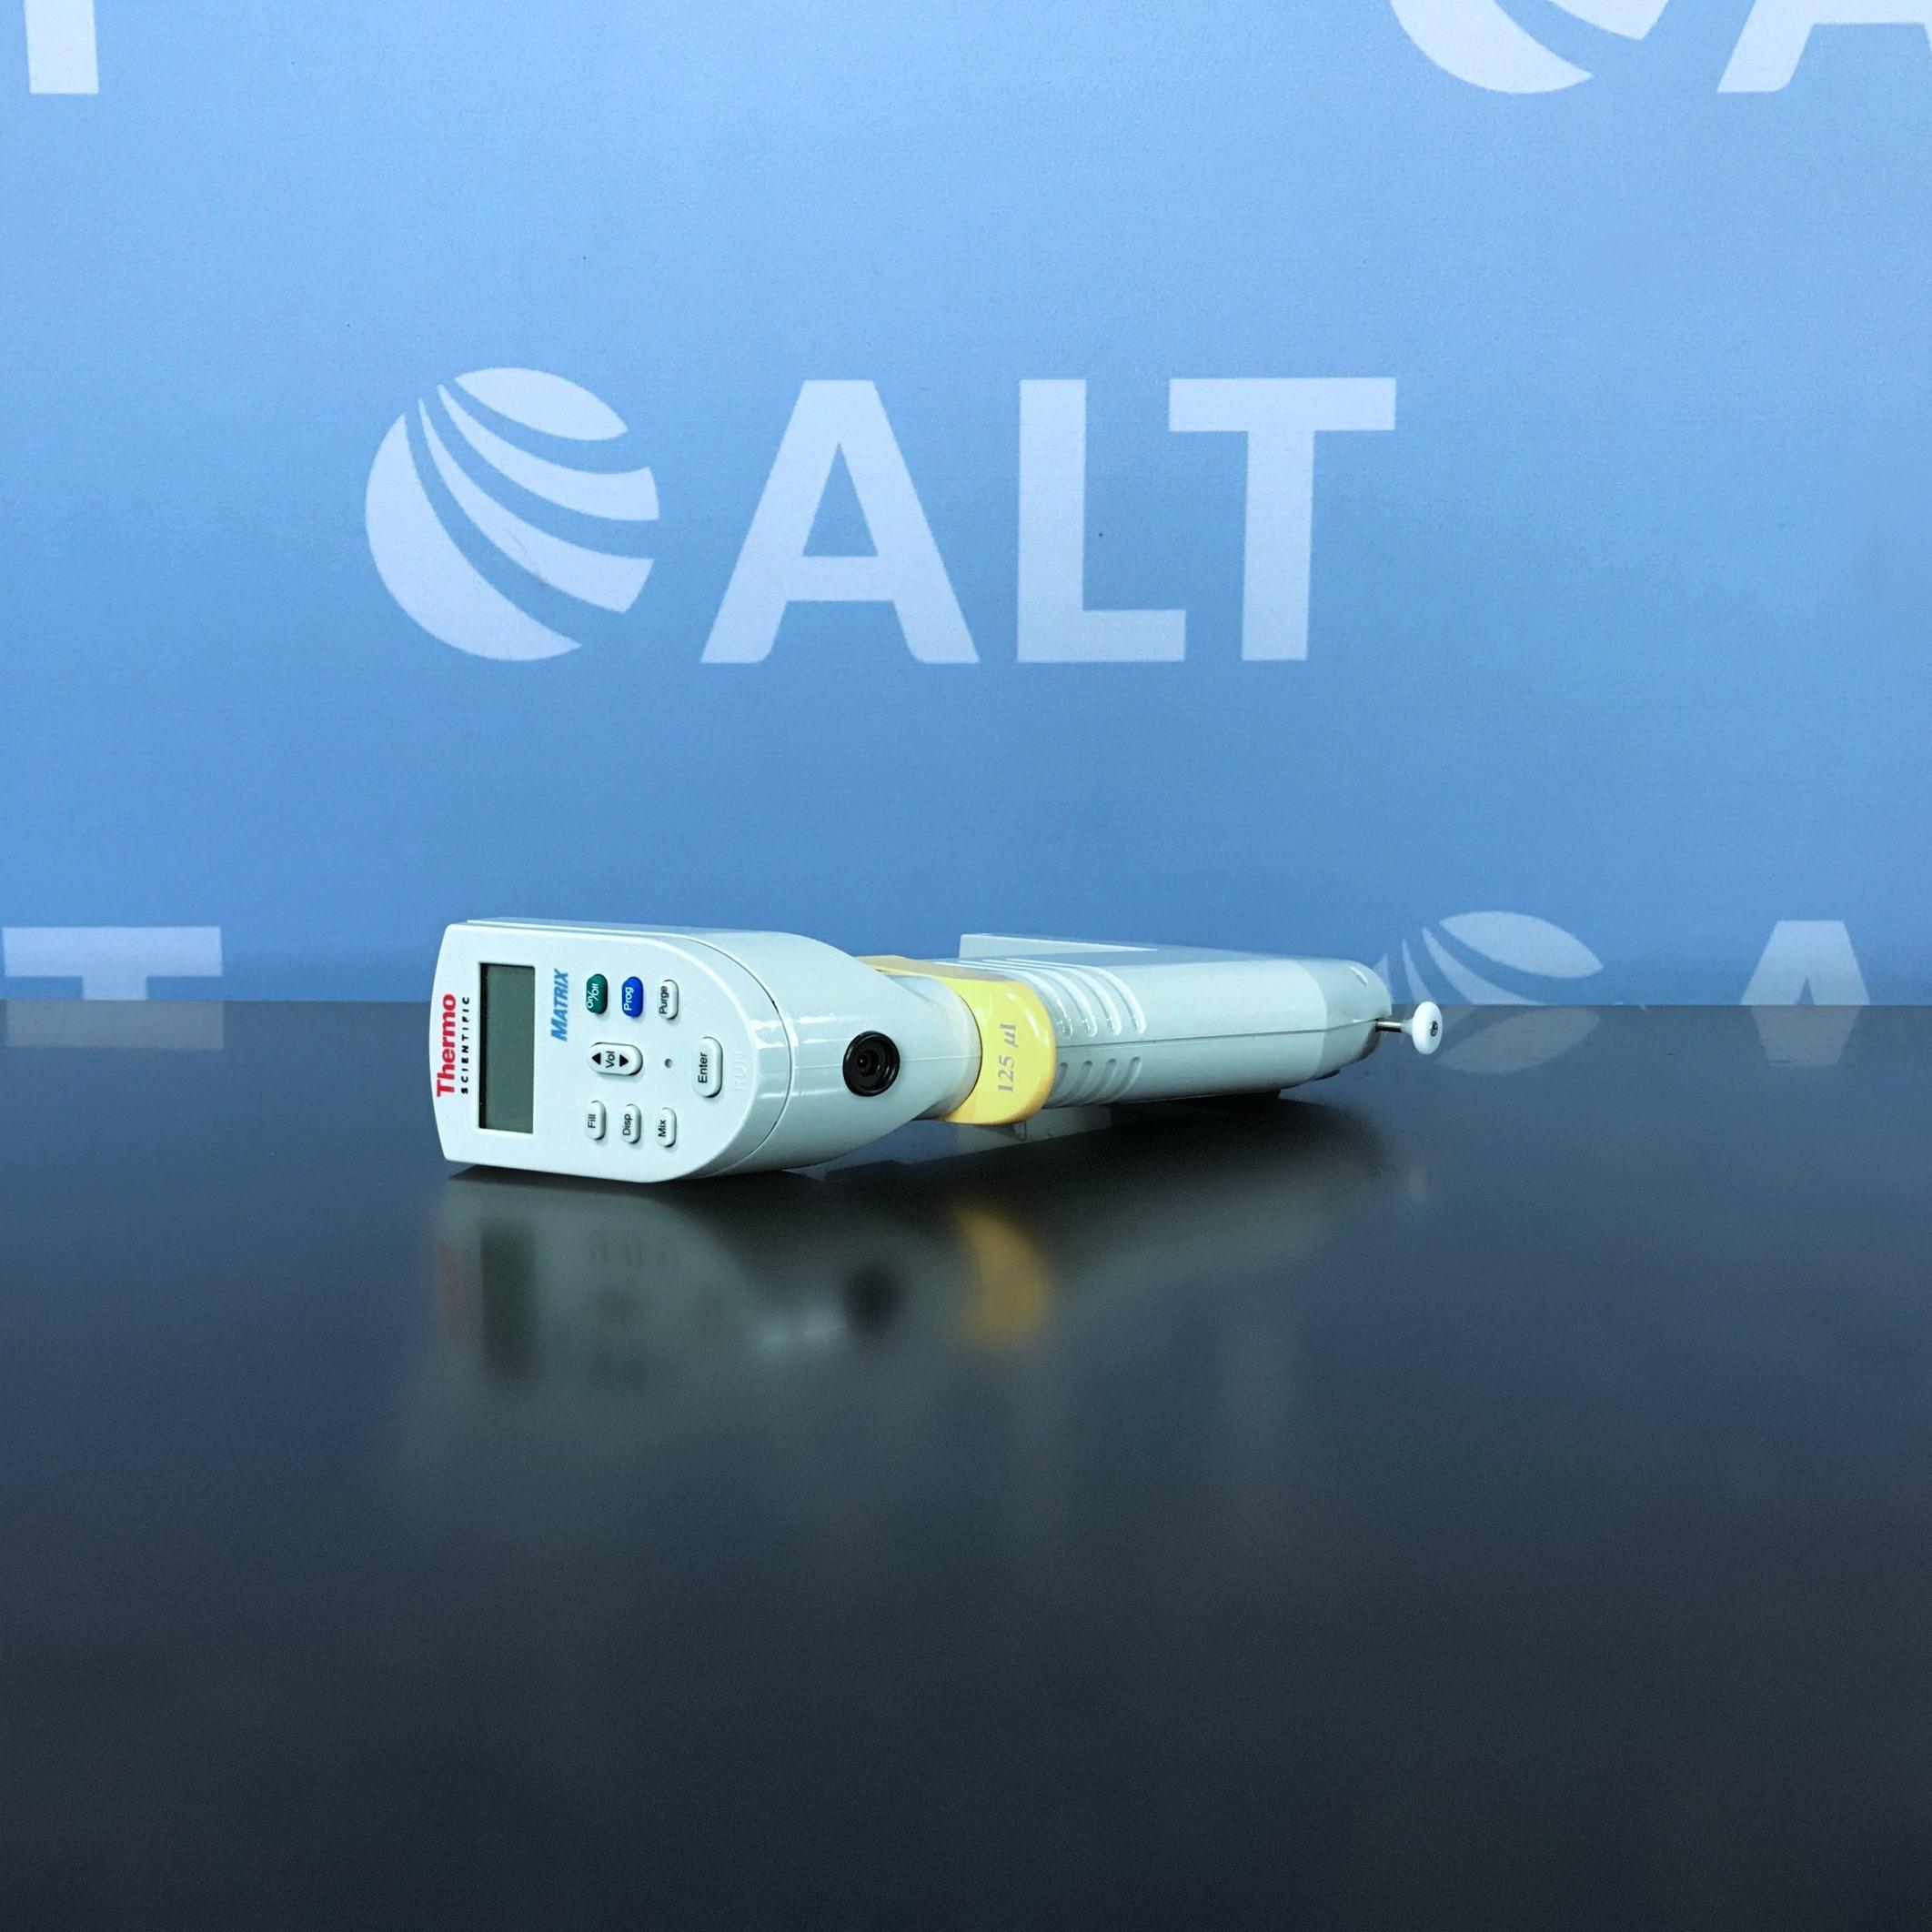 Thermo Scientific Matrix 125 uL 8-Channel Electronic Pipette Image